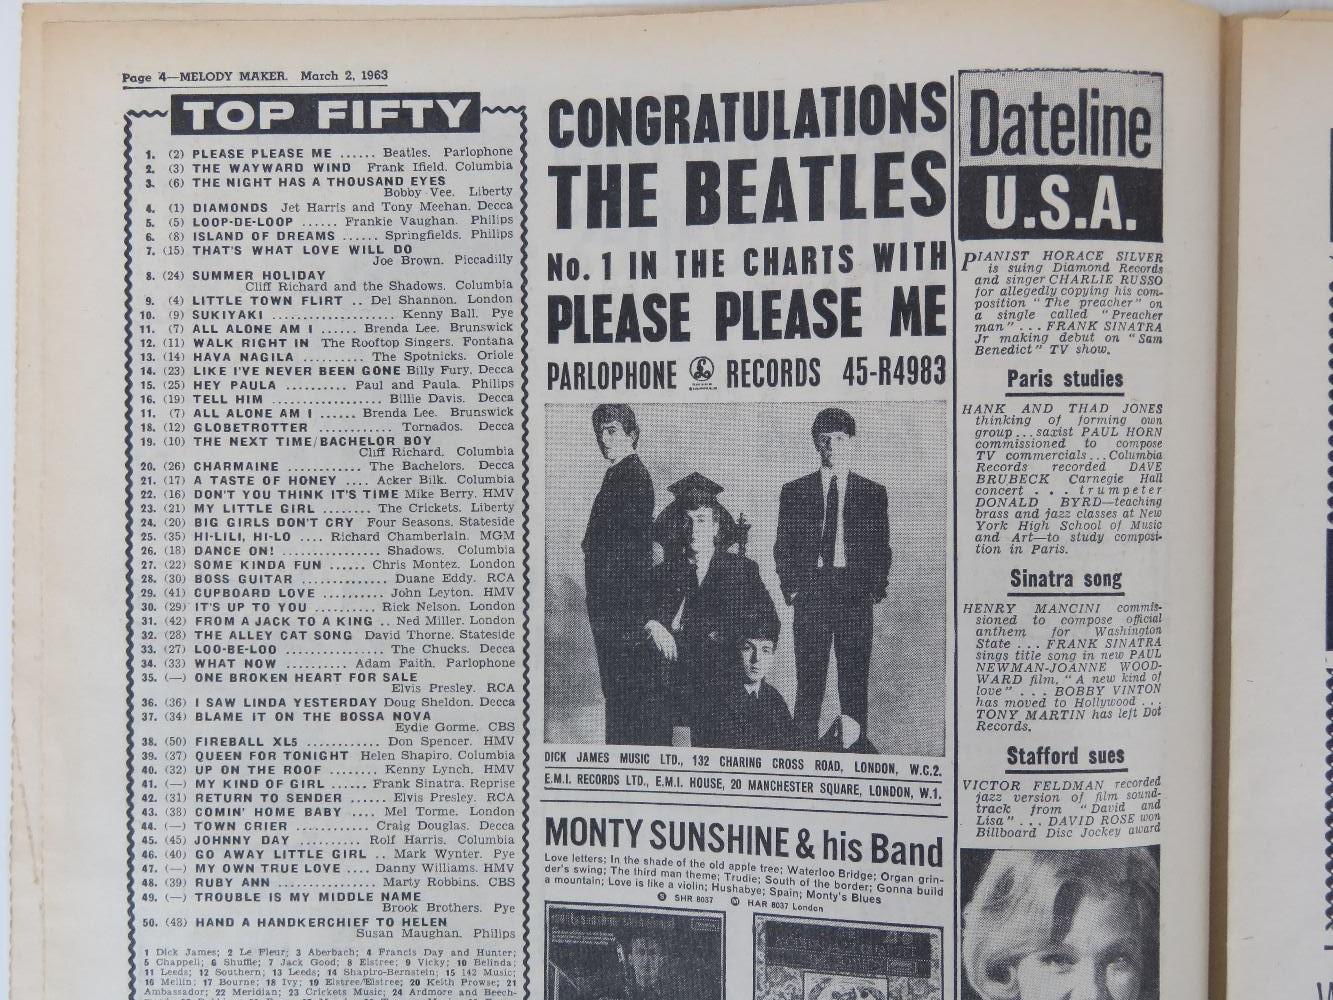 Lot 654 - Beatles; an original copy of 'Melody Mak